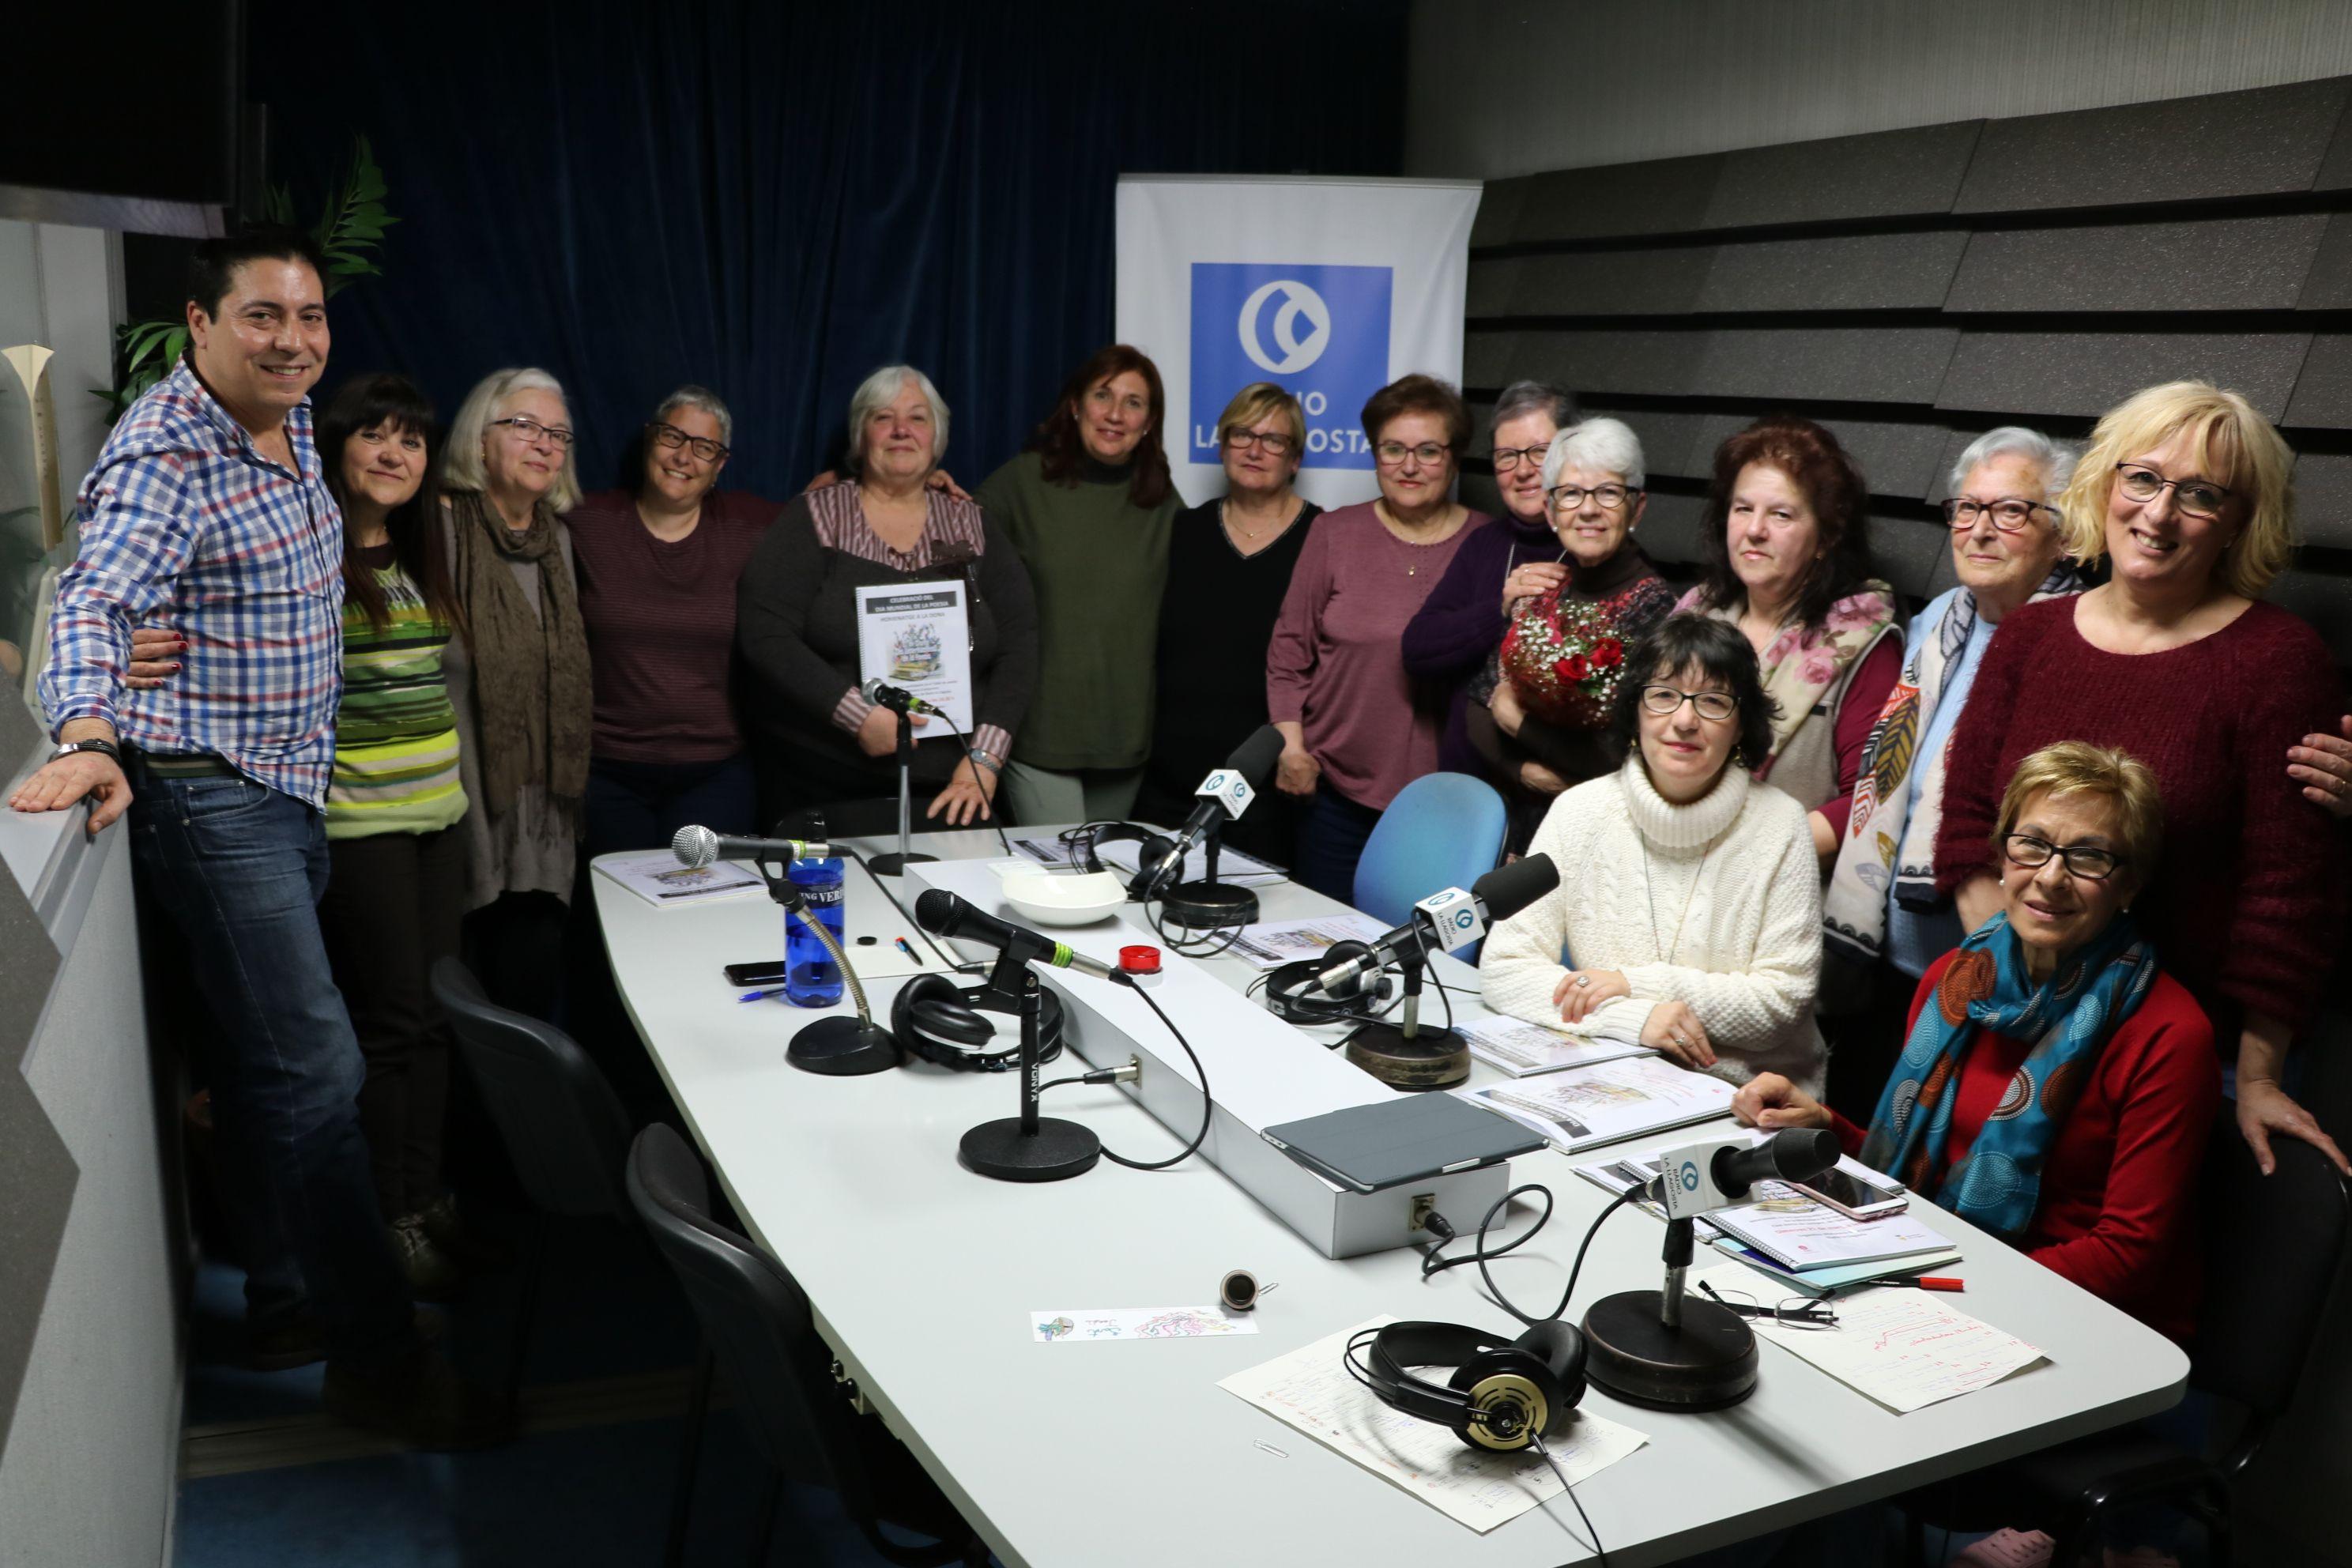 La Biblioteca i Ràdio la Llagosta celebren el Dia Mundial de la Poesia